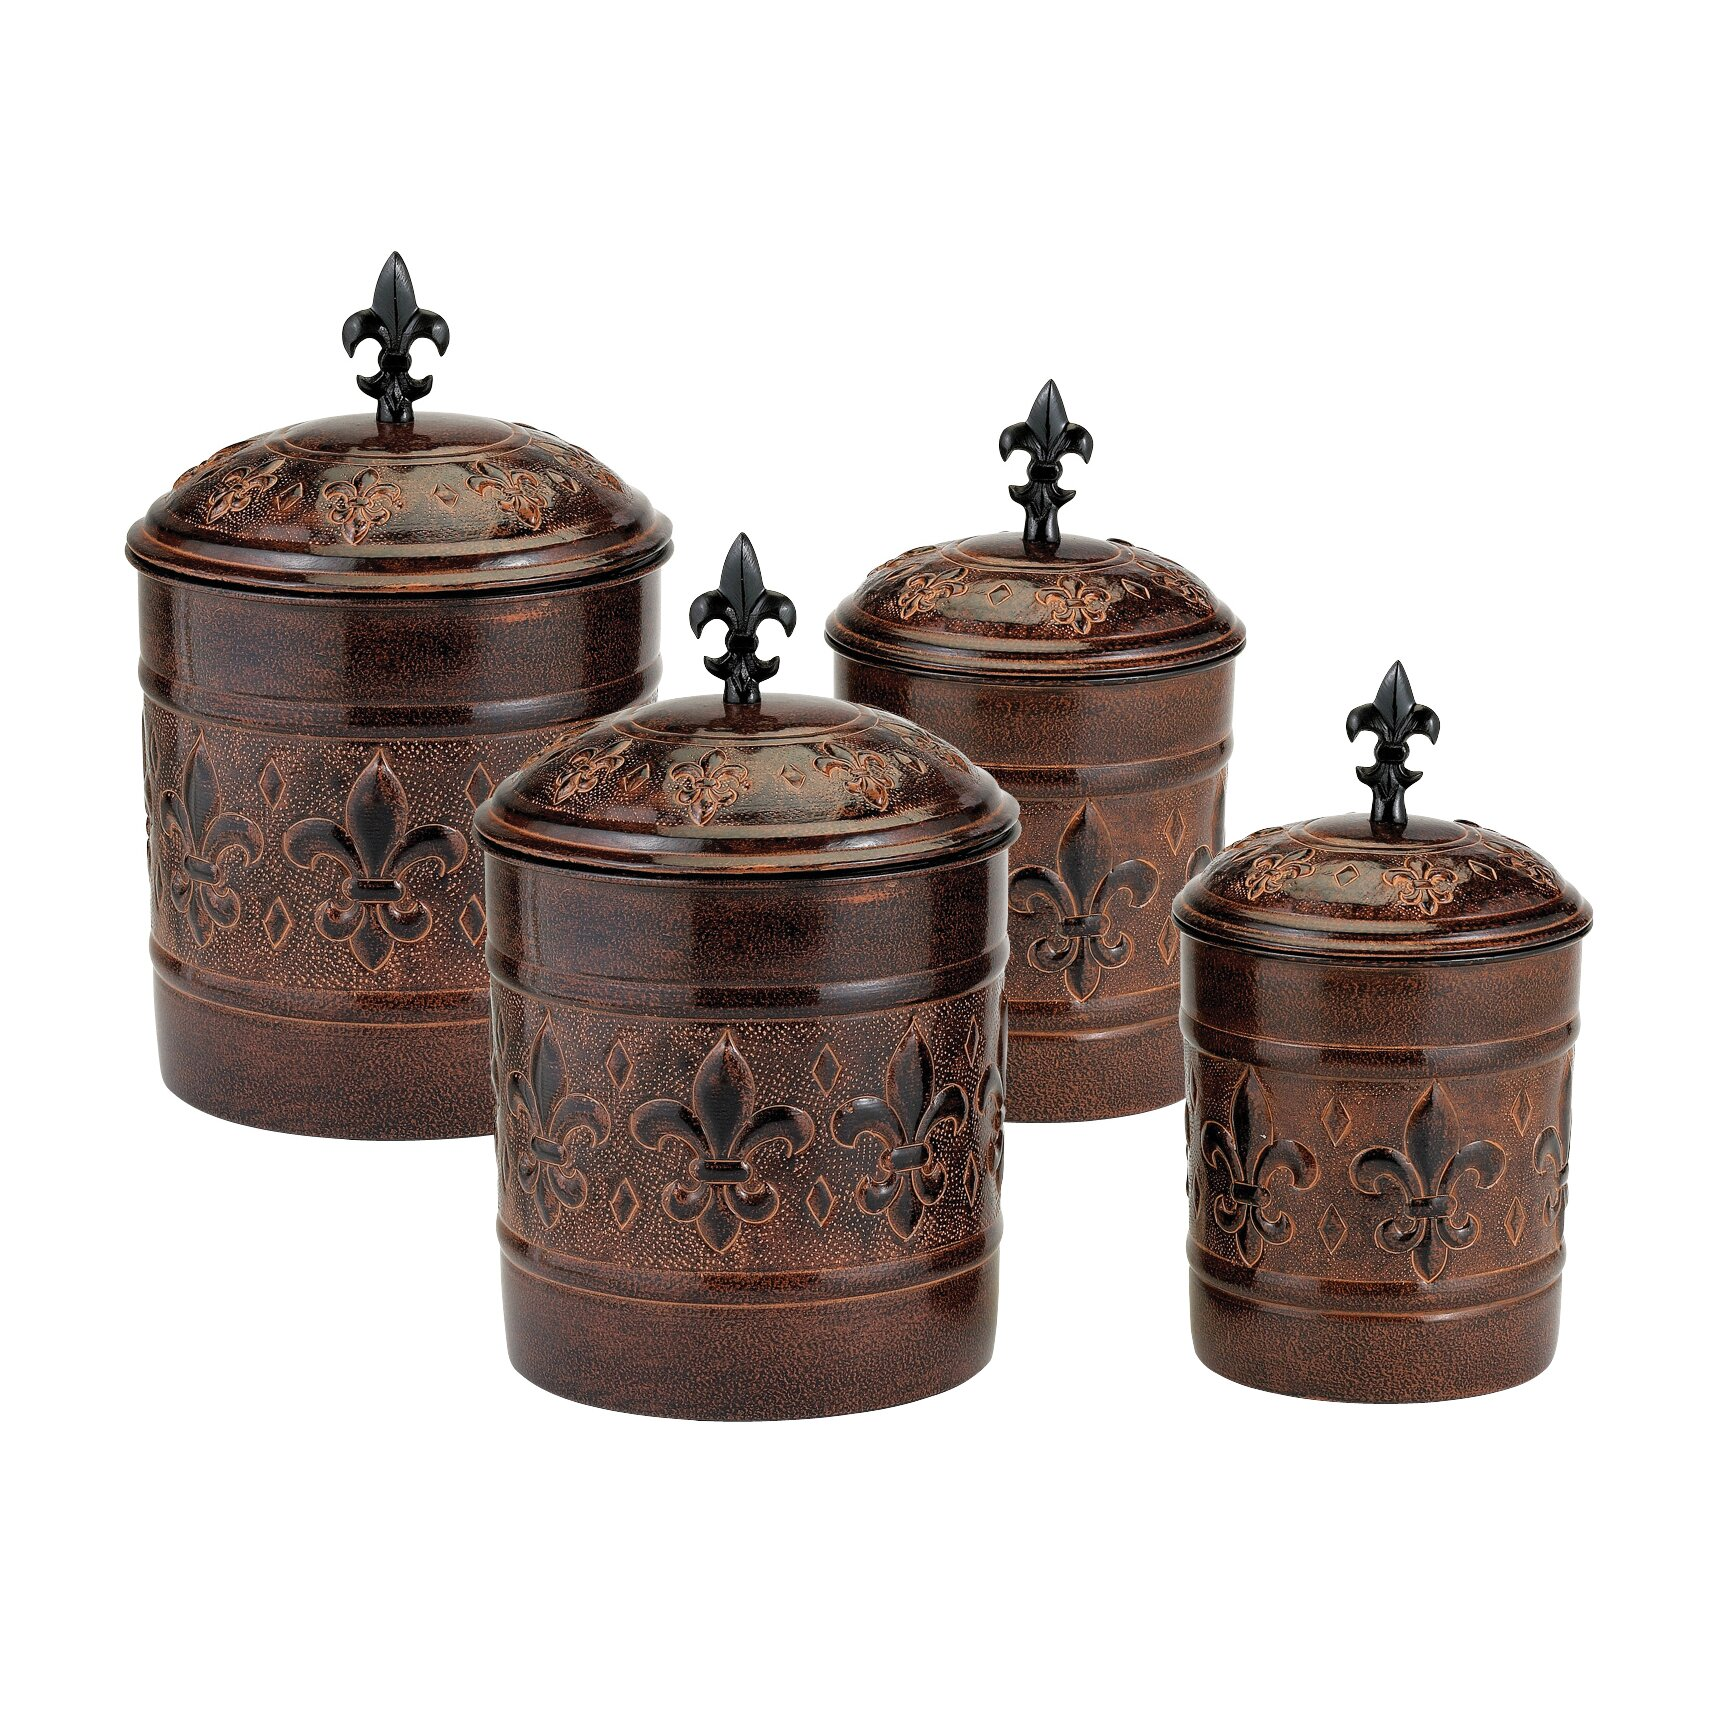 Old Dutch Versailles 4-Piece Decorative Canister Set